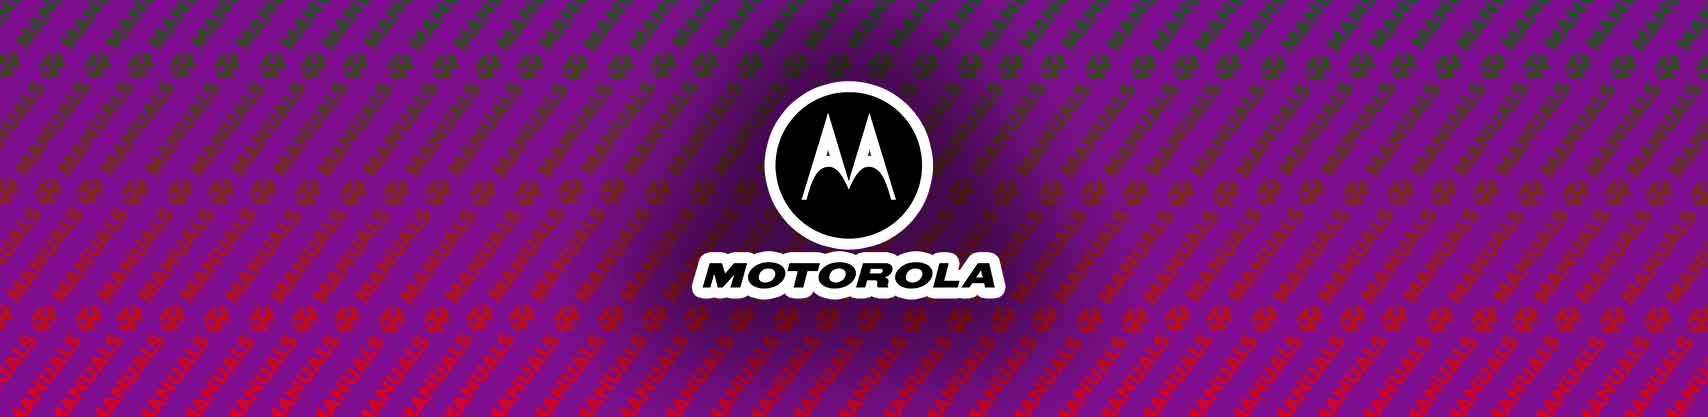 Motorola Moto G6 User Manual